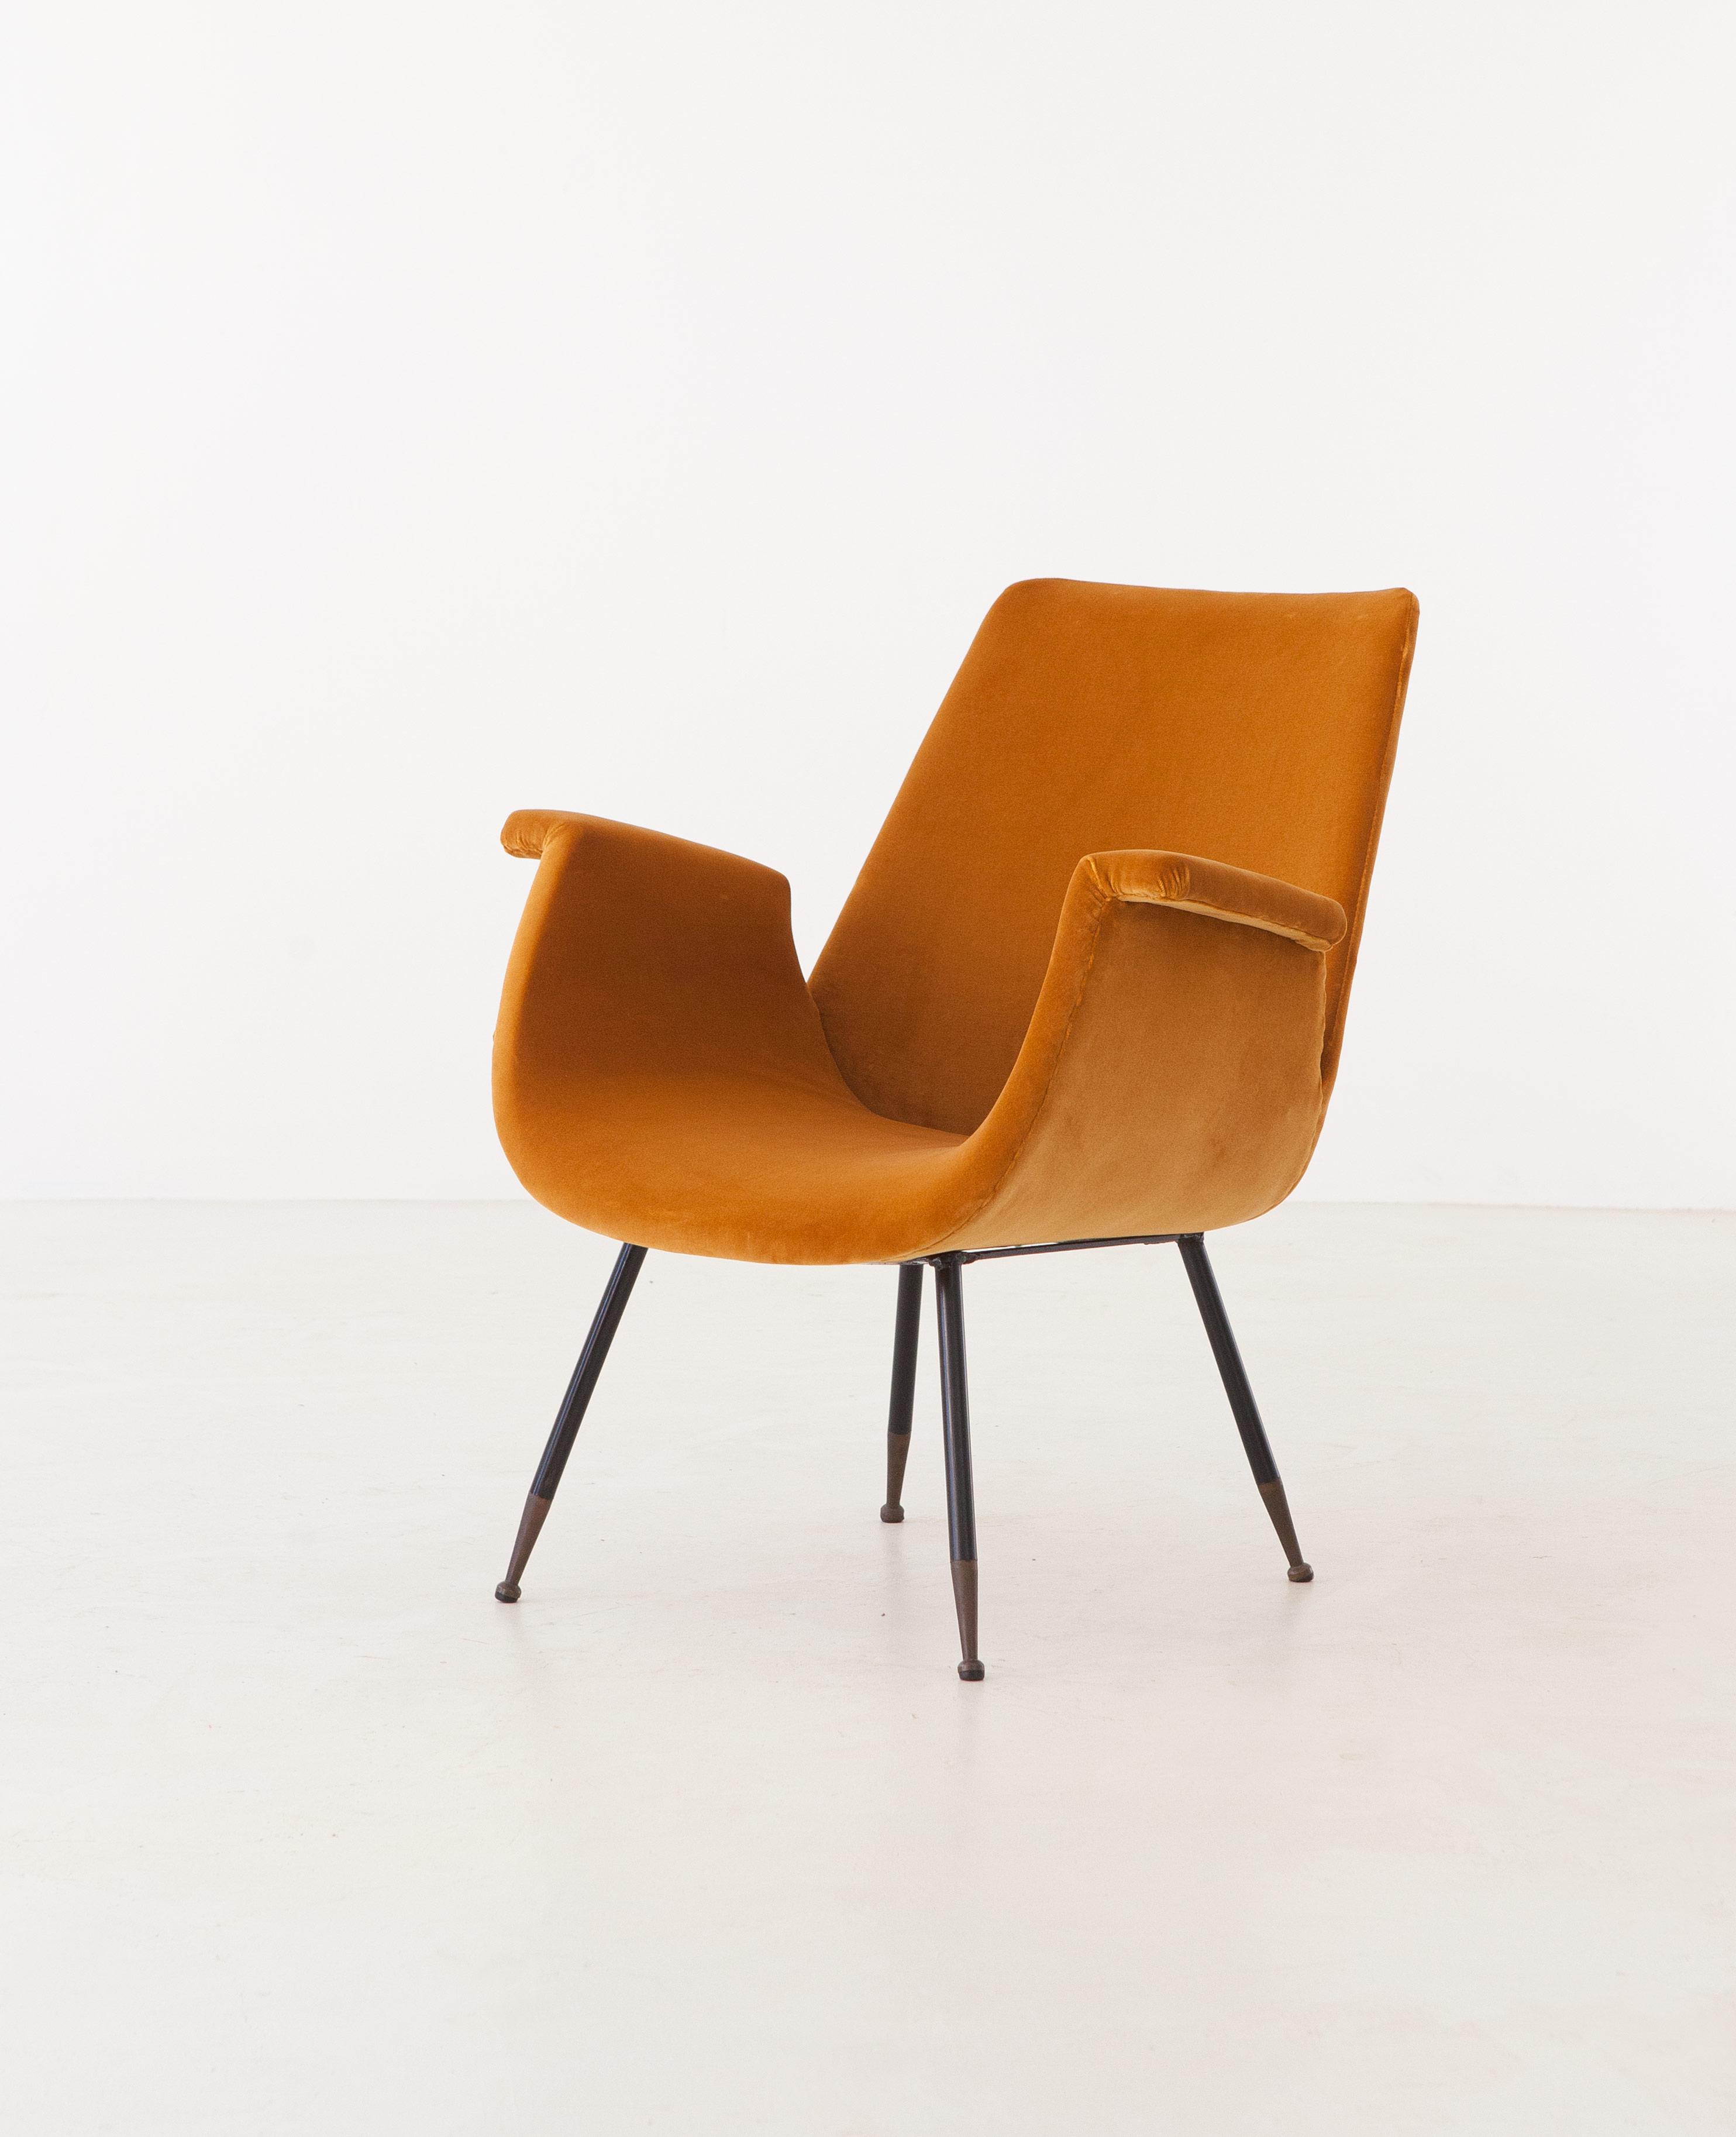 1950s-gastone-rinaldi-yellow-velvet-lounge-armchair-5-se316